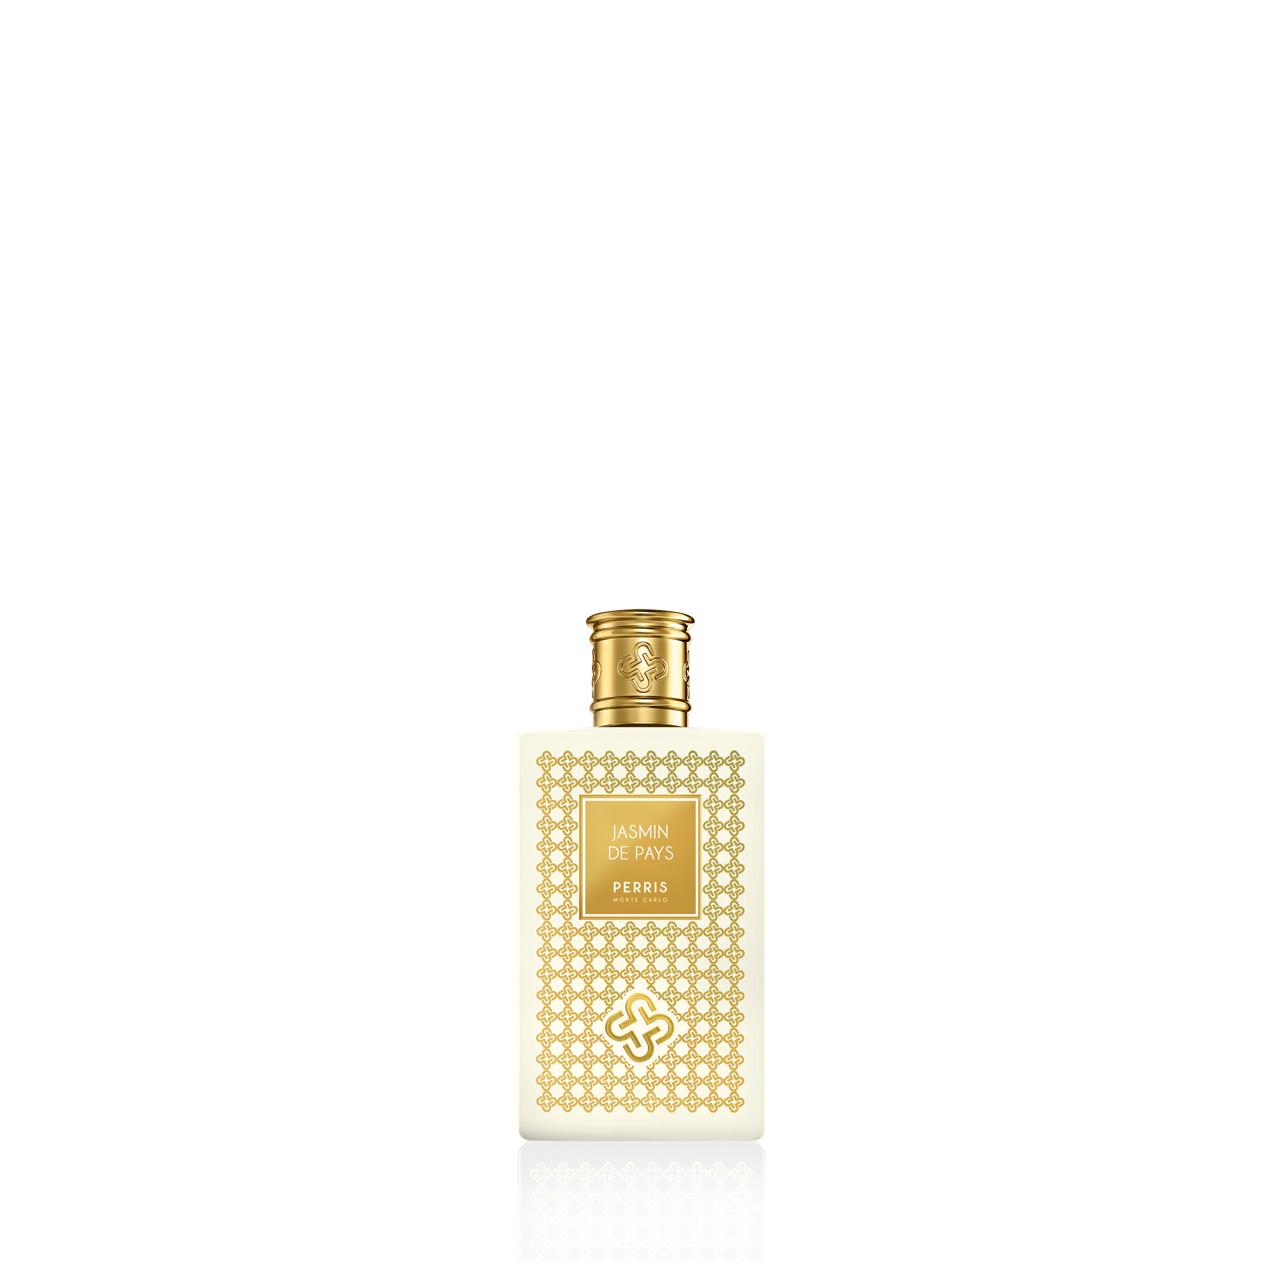 Jasmin de Pays - Eau de Parfum